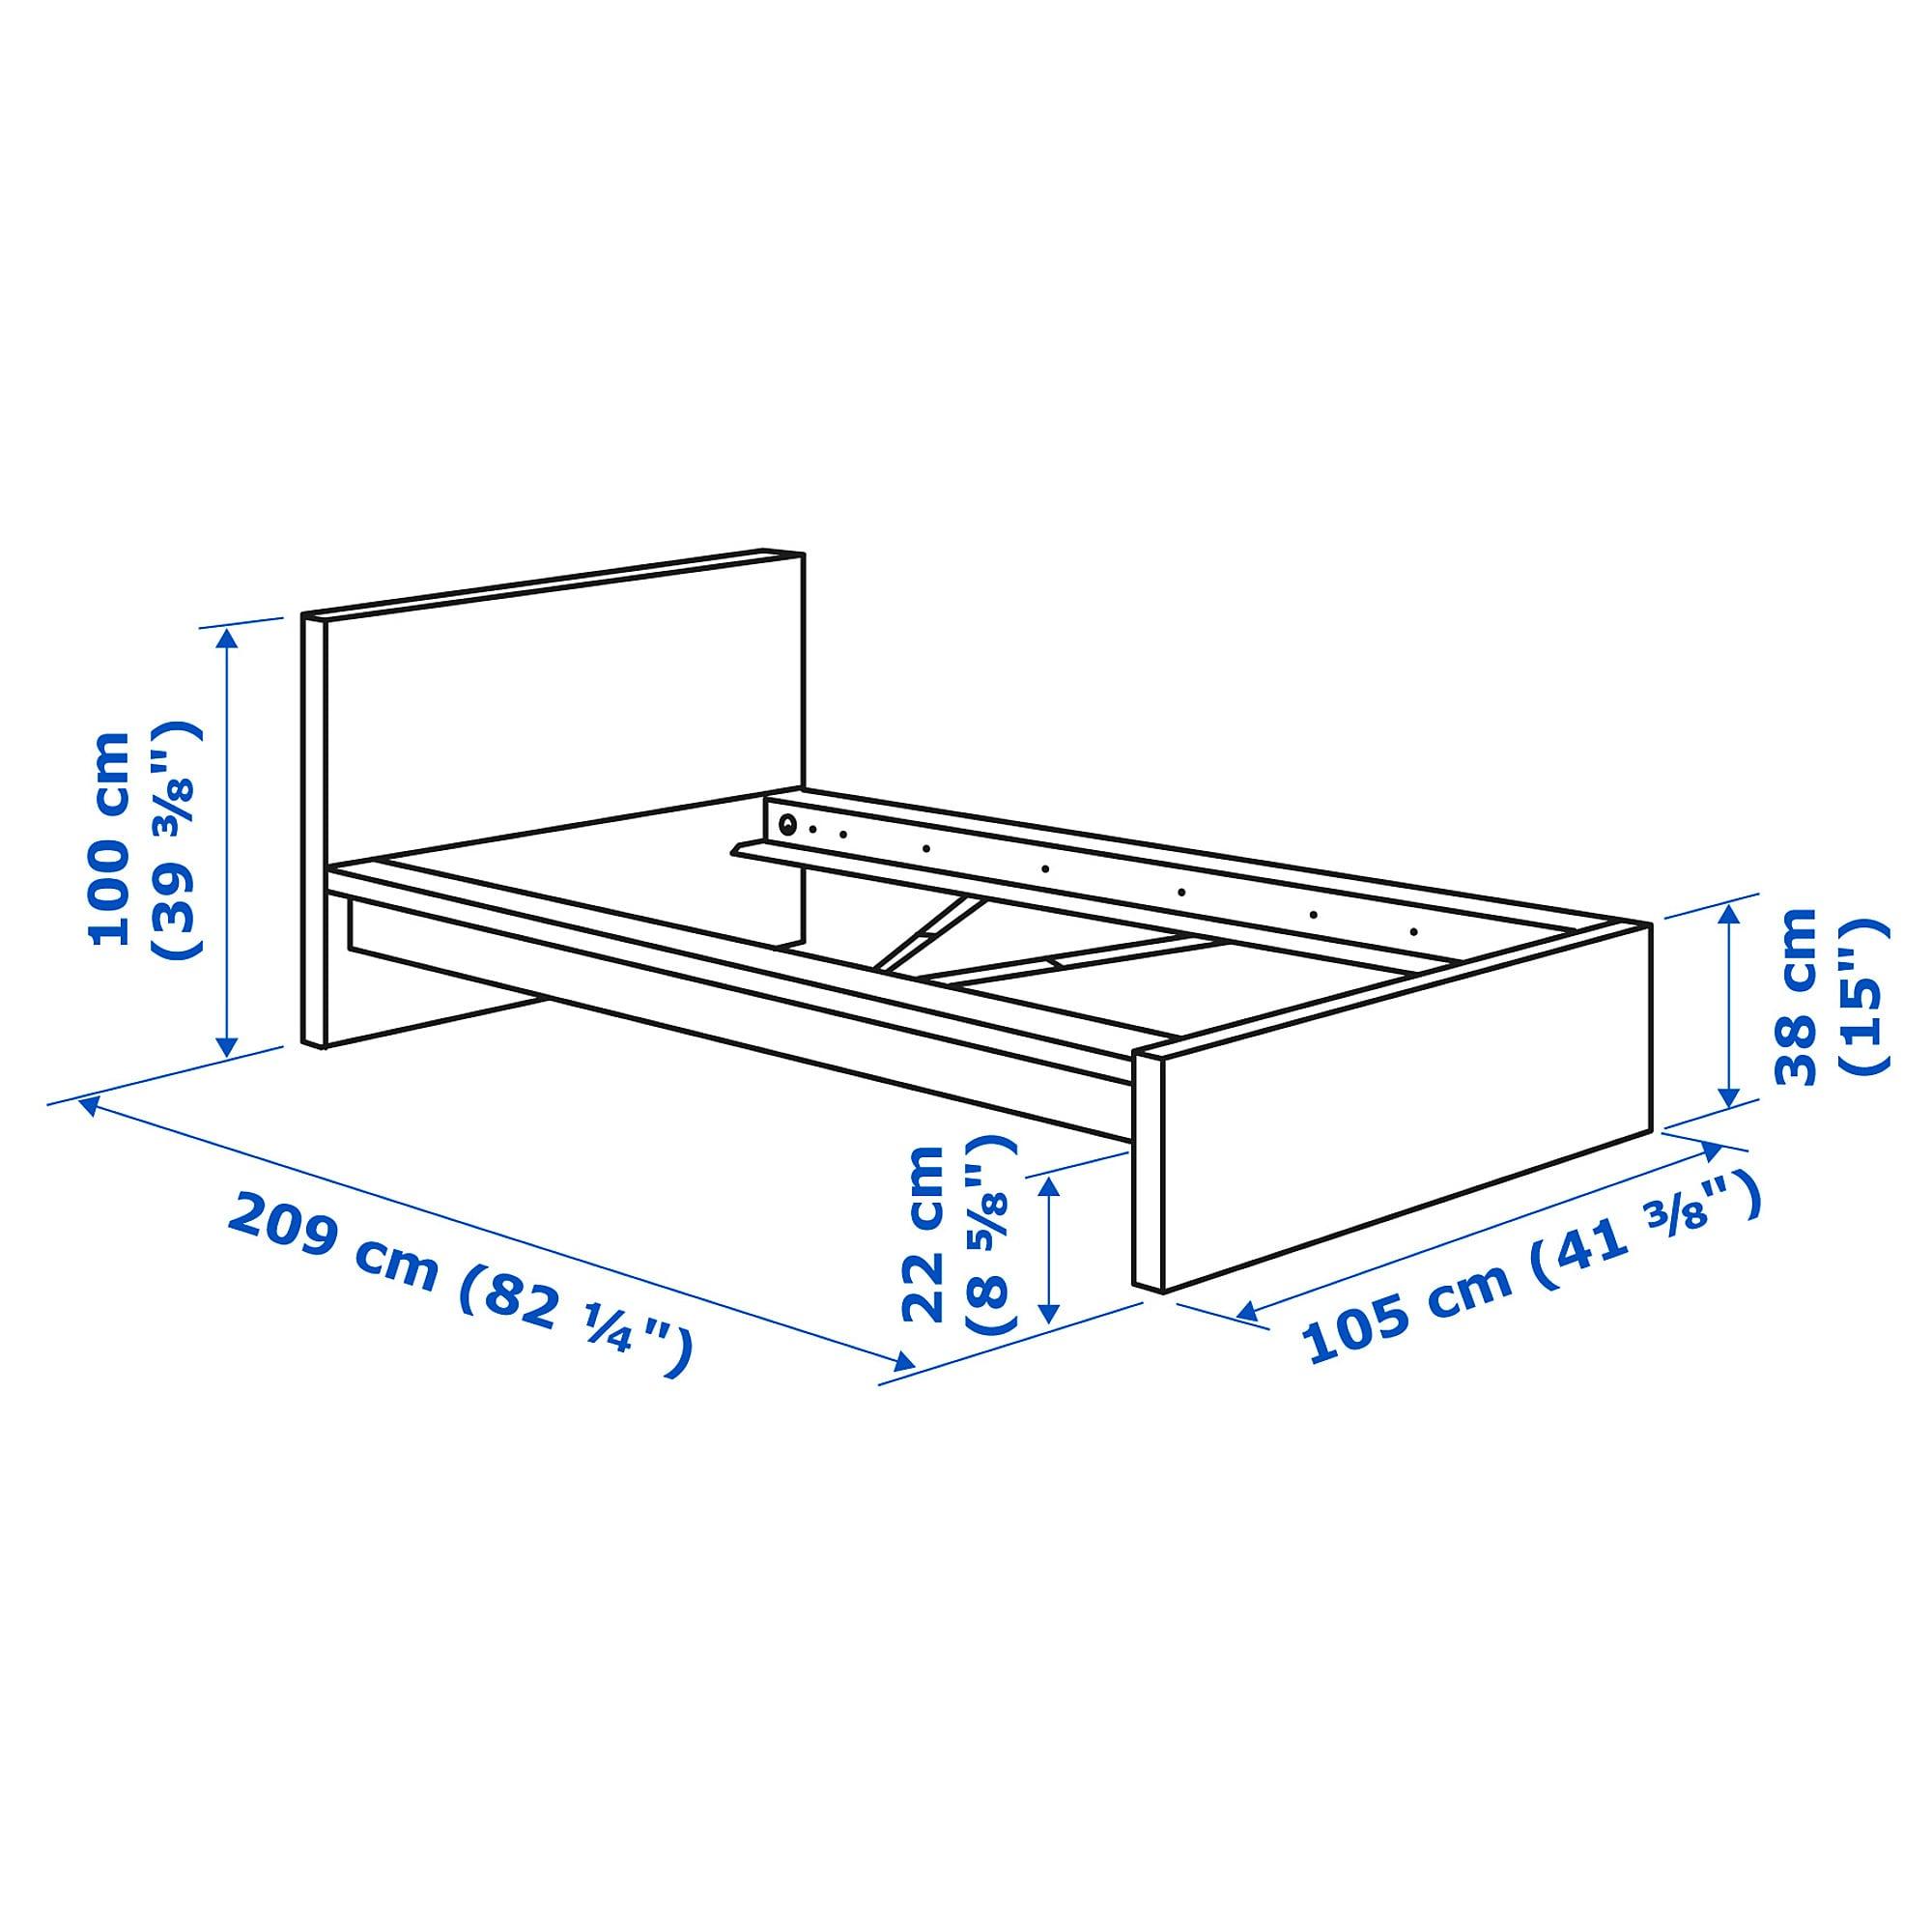 Размеры кроватей — стандарты